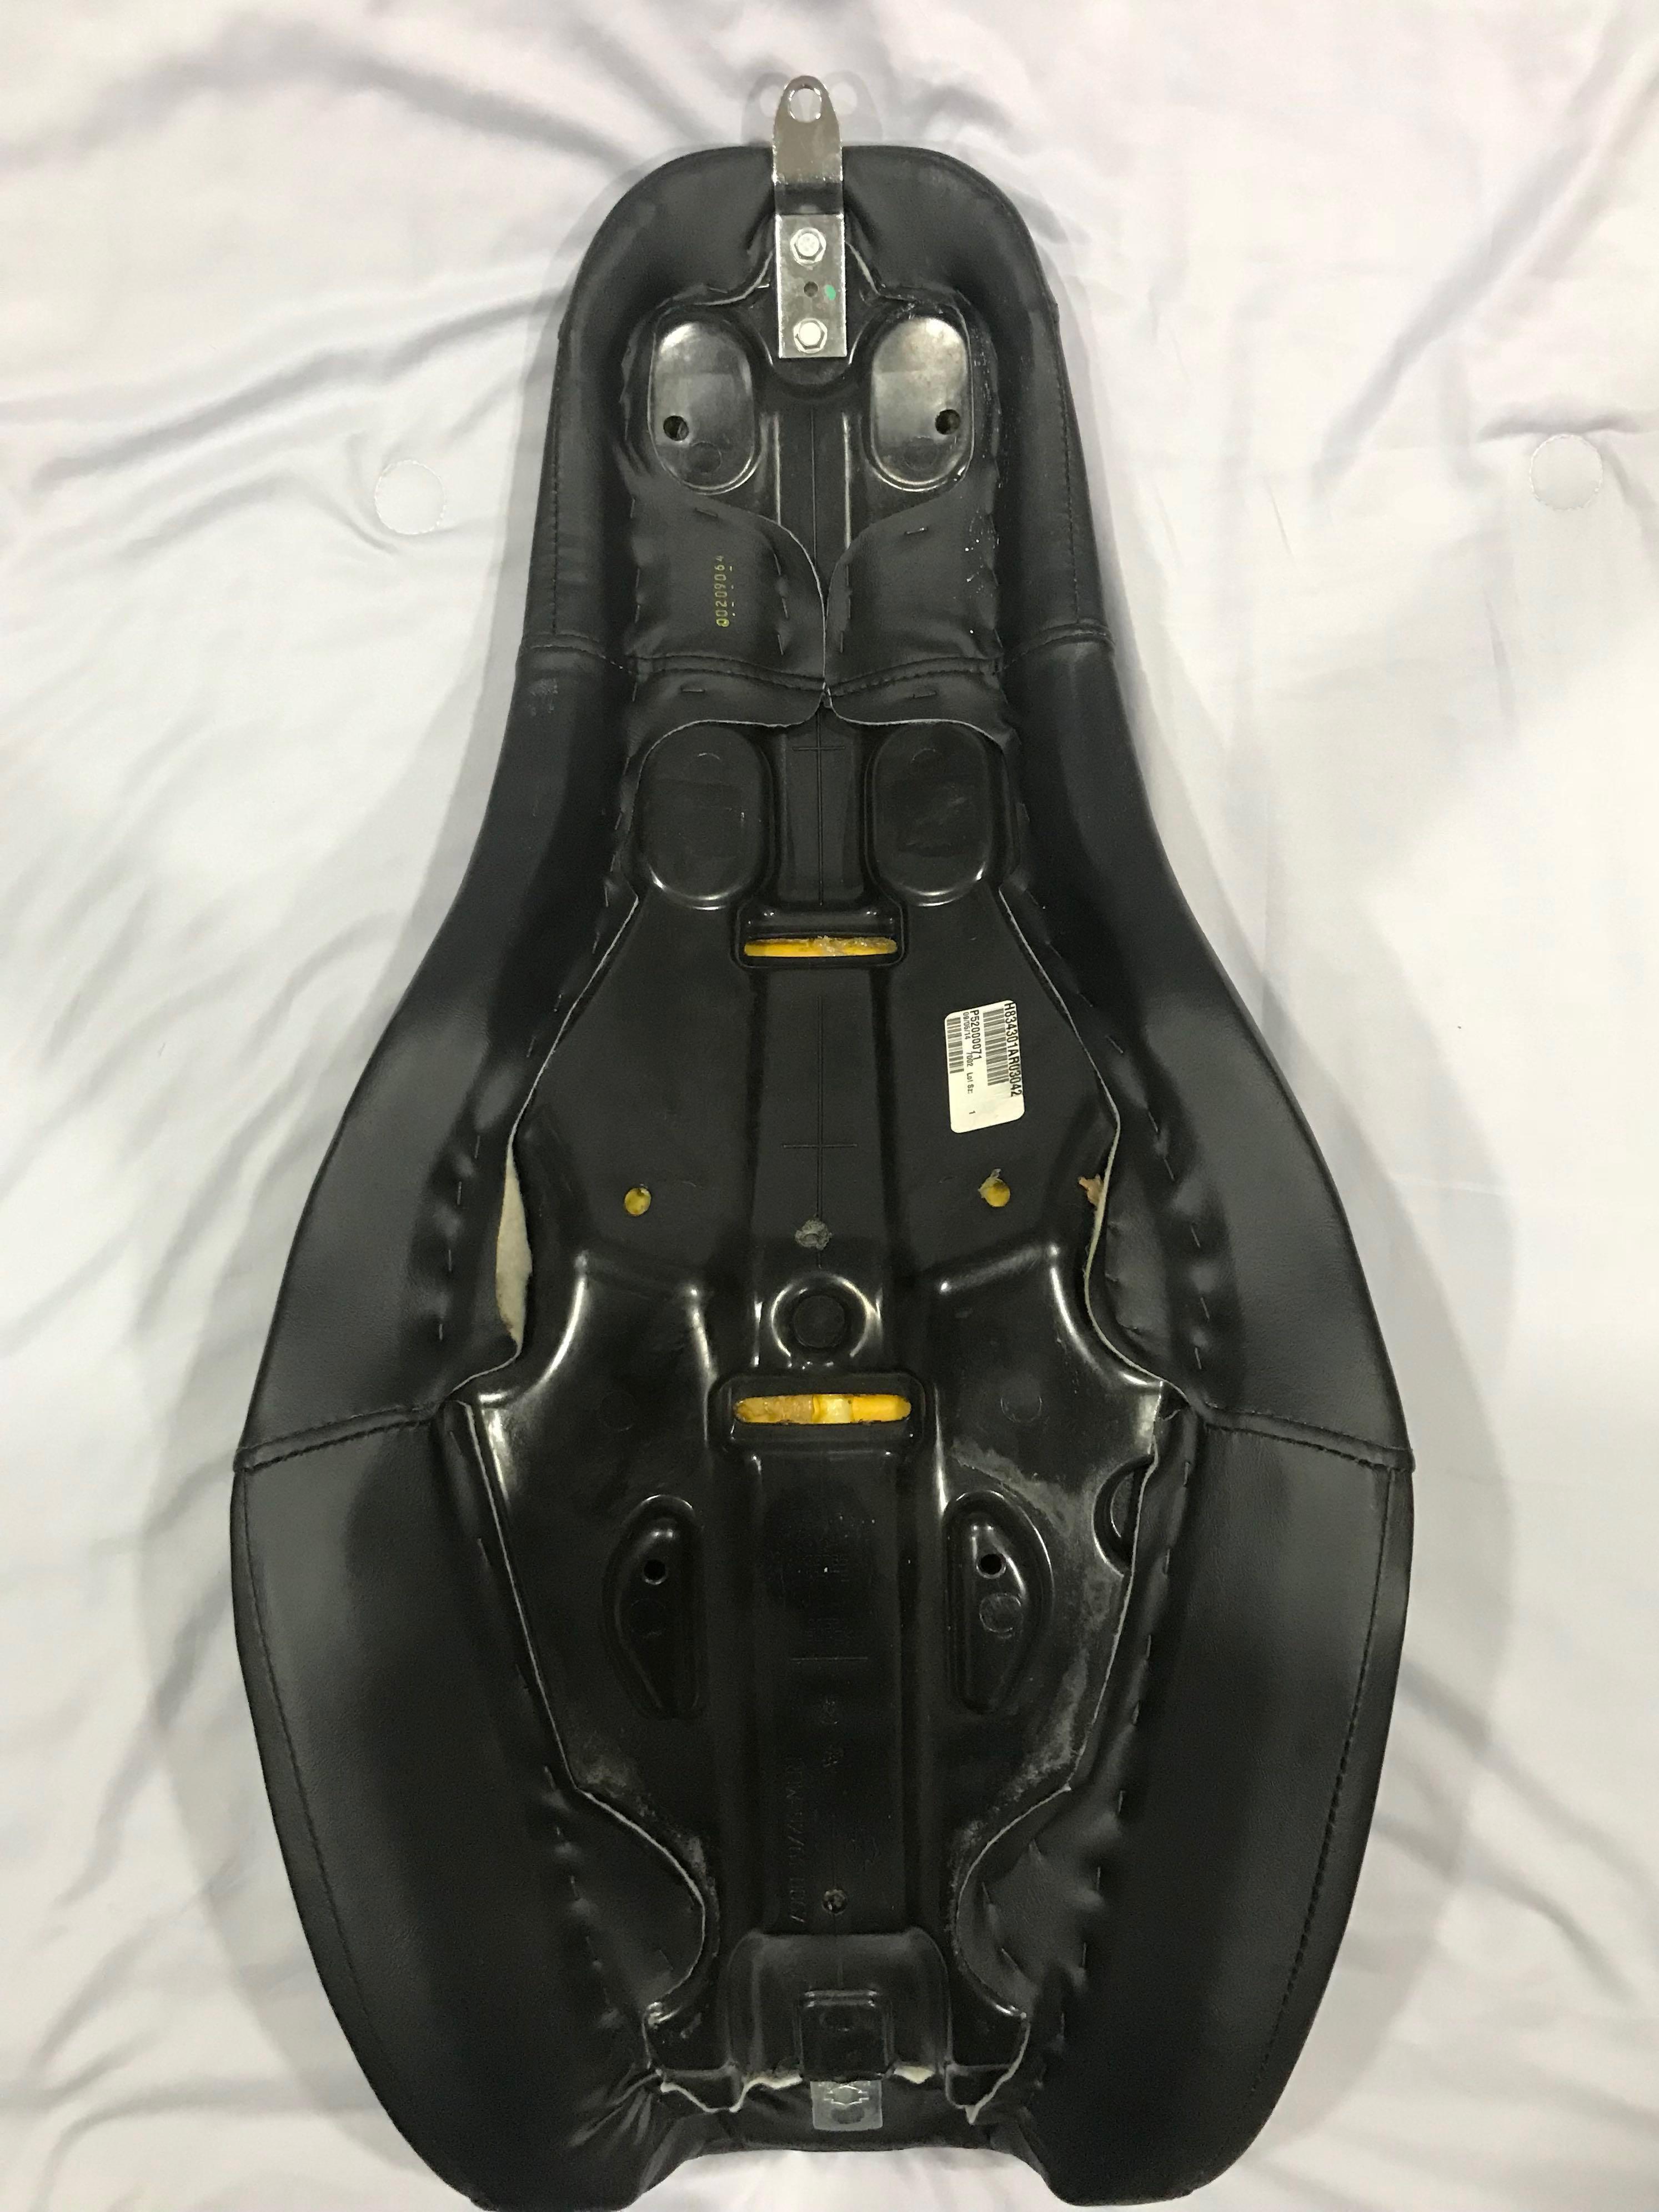 Badlander 2 Up Seat For Dyna Harley Davidson Motorbikes Motorbike Side Bag Japstyle Accessories On Carousell